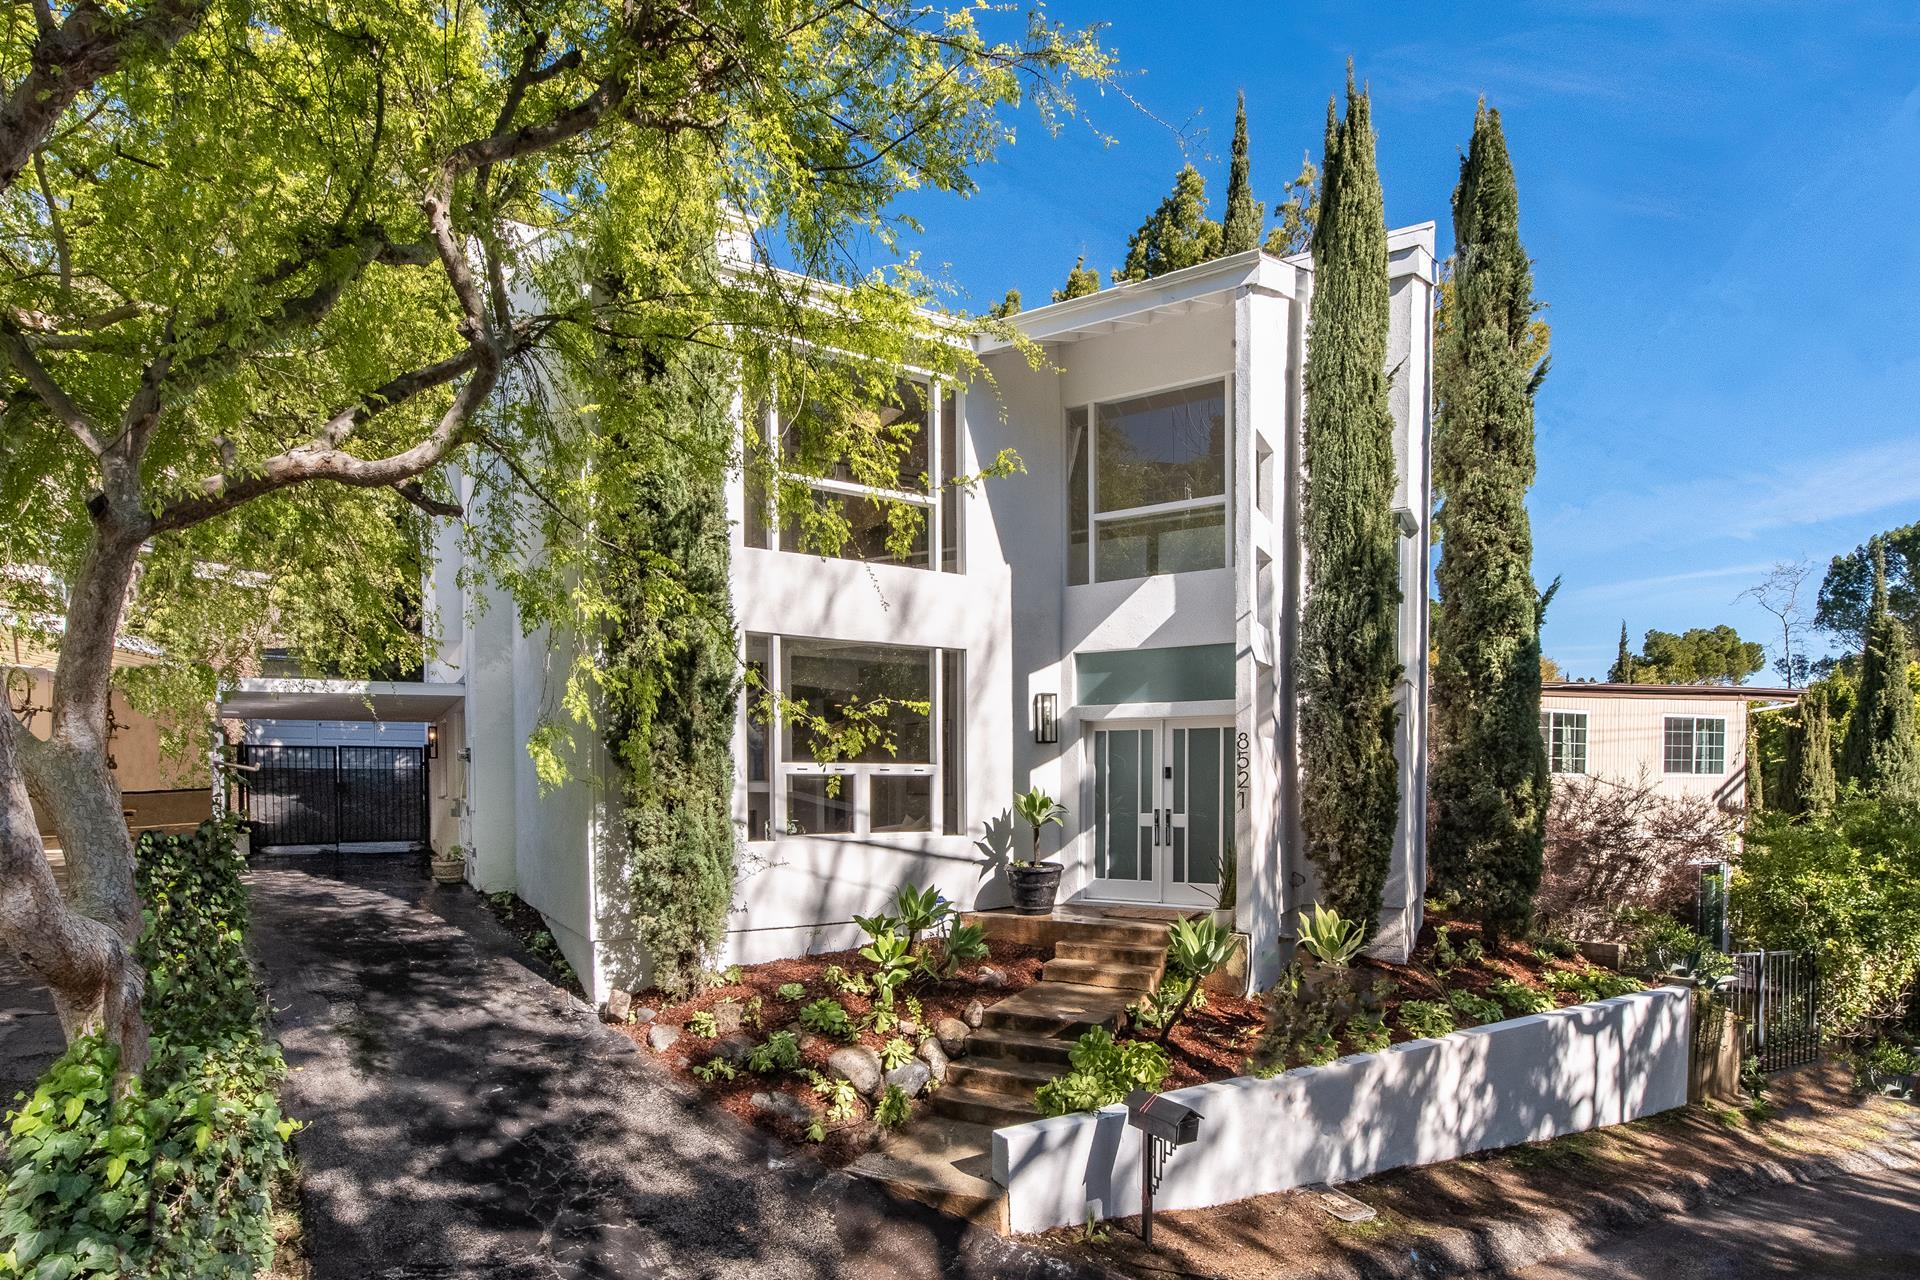 8521 APPIAN Way - Sunset Strip / Hollywood Hills West, California